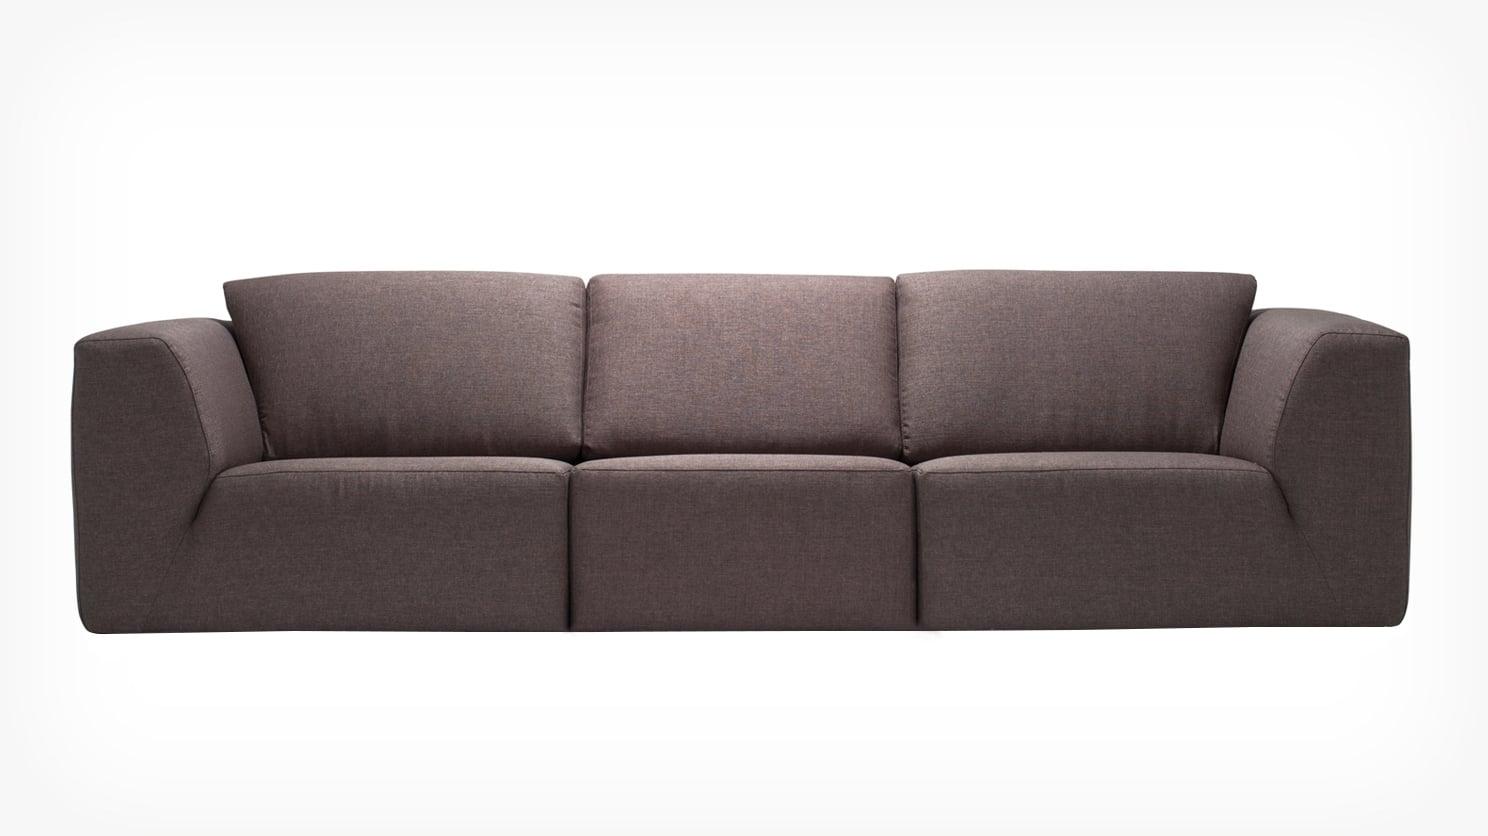 morten 3 piece sectional sofa polo slate front 0